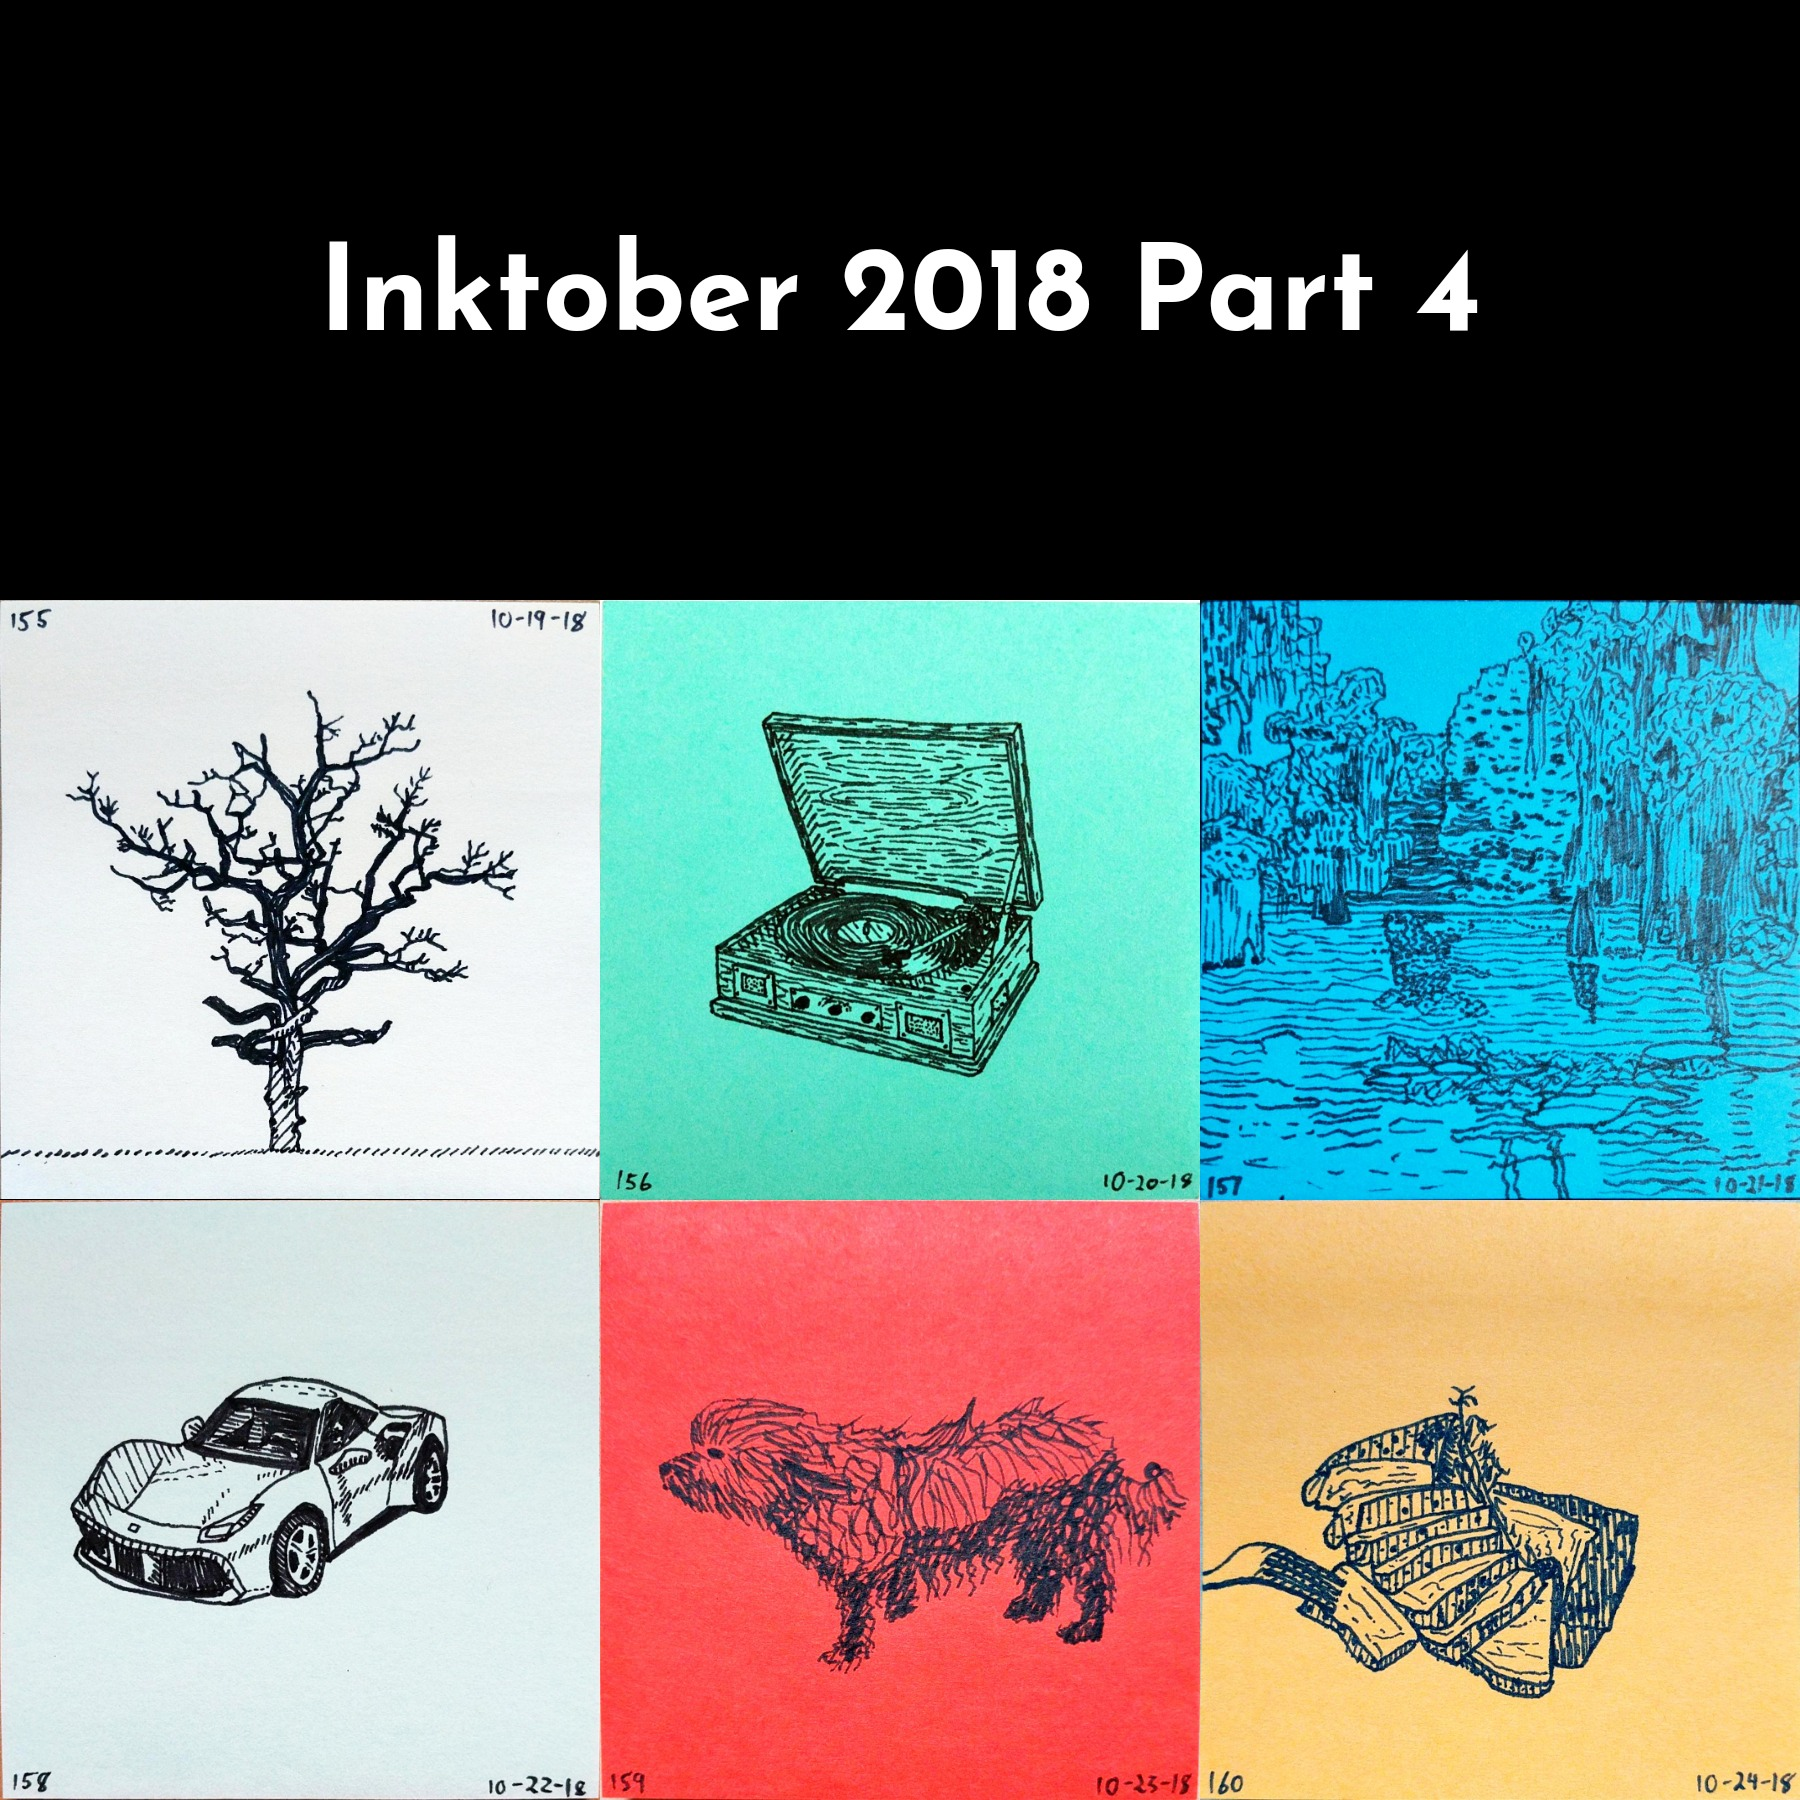 Inktober 2018 Part 4